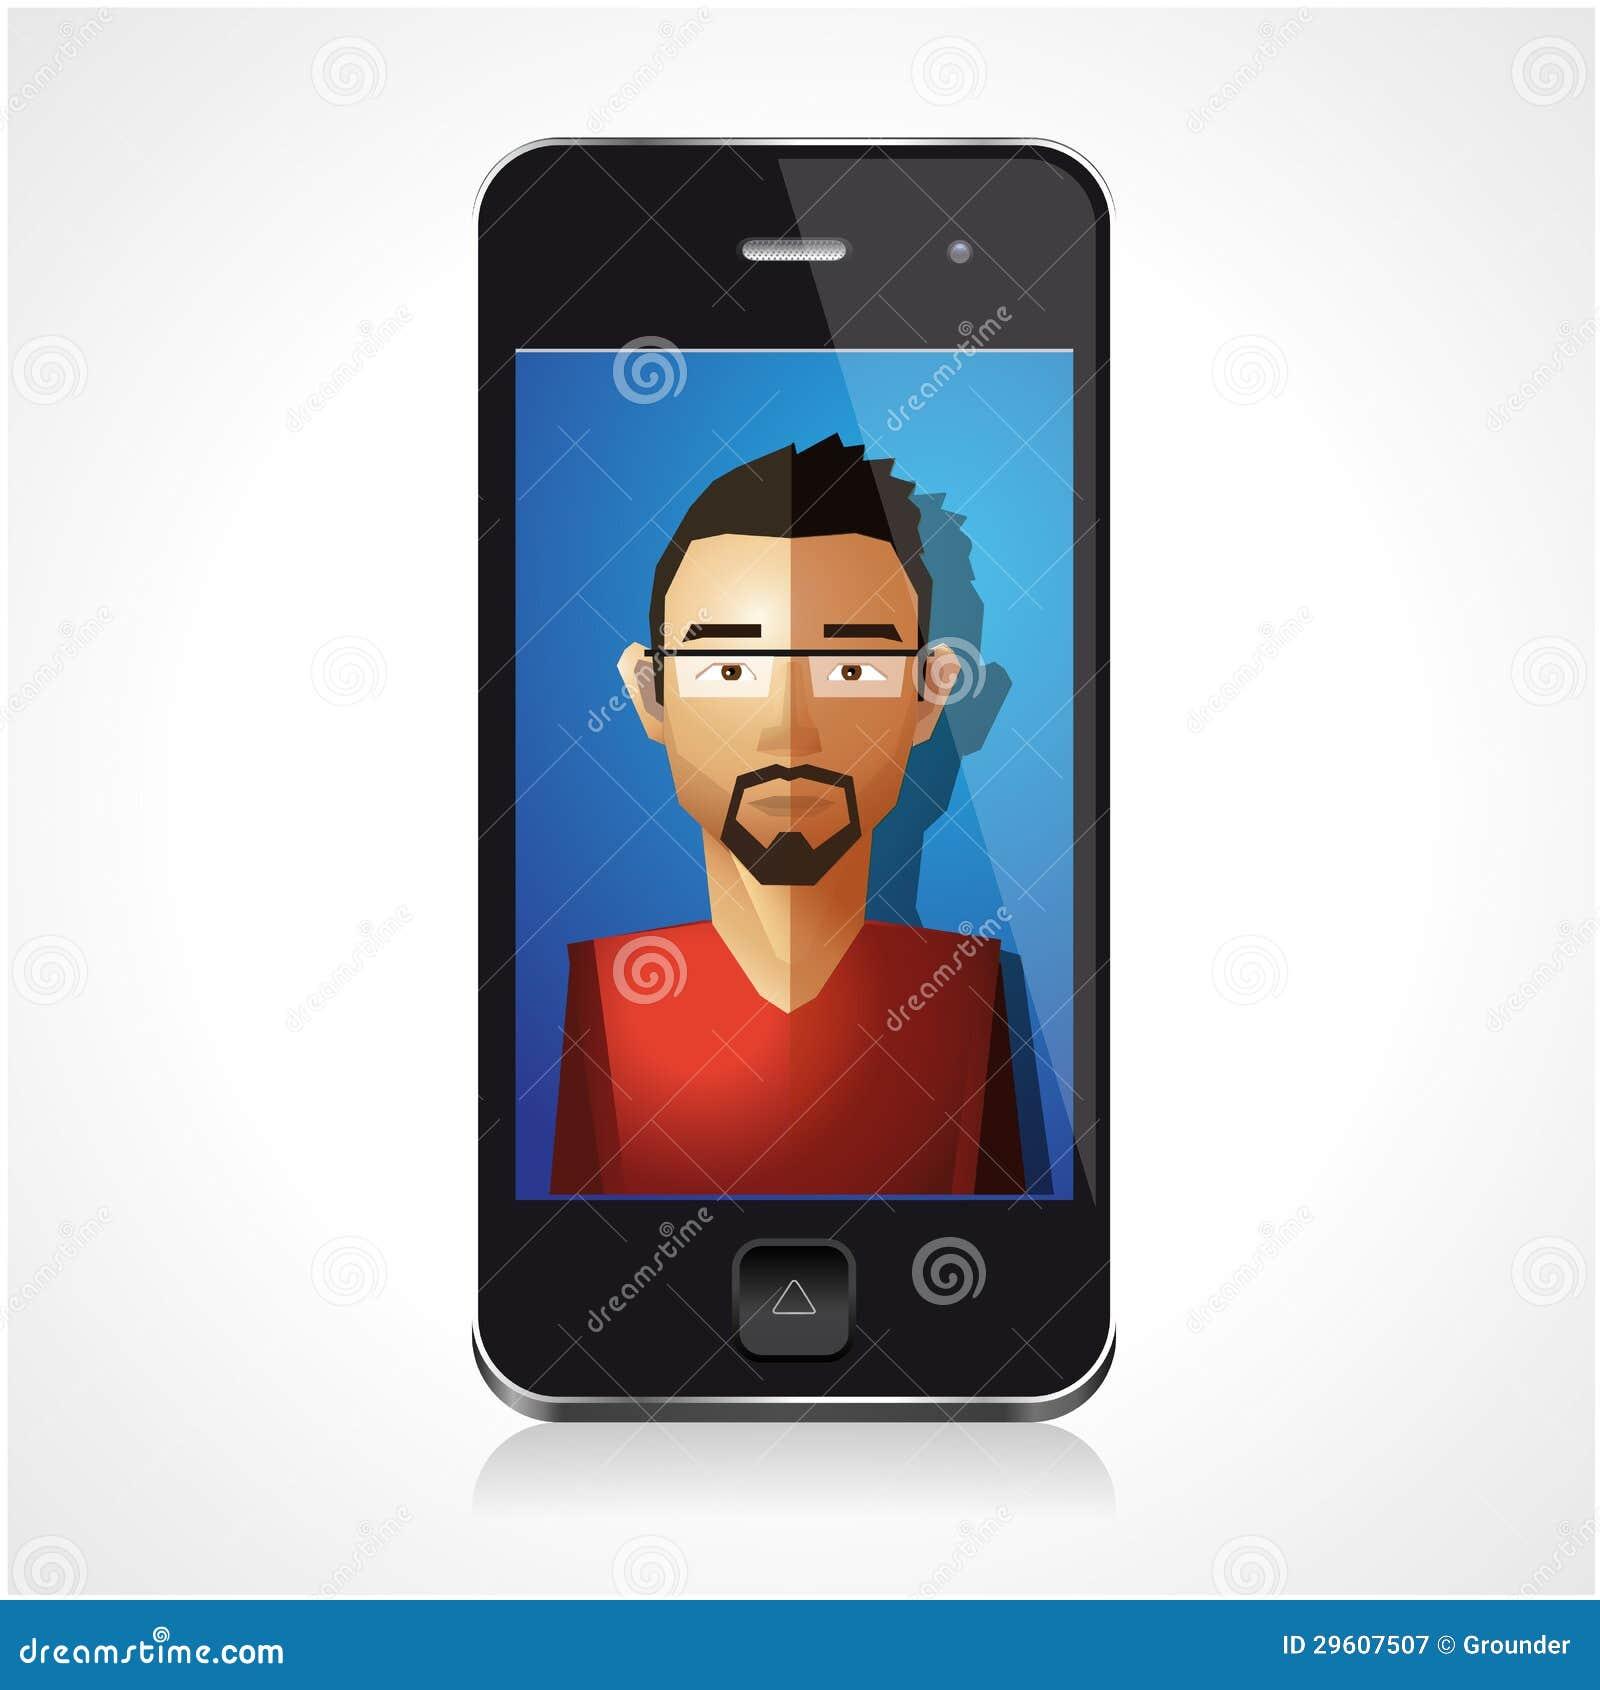 Cartoon Characters Phone Numbers : Cartoon character smartphone royalty free stock